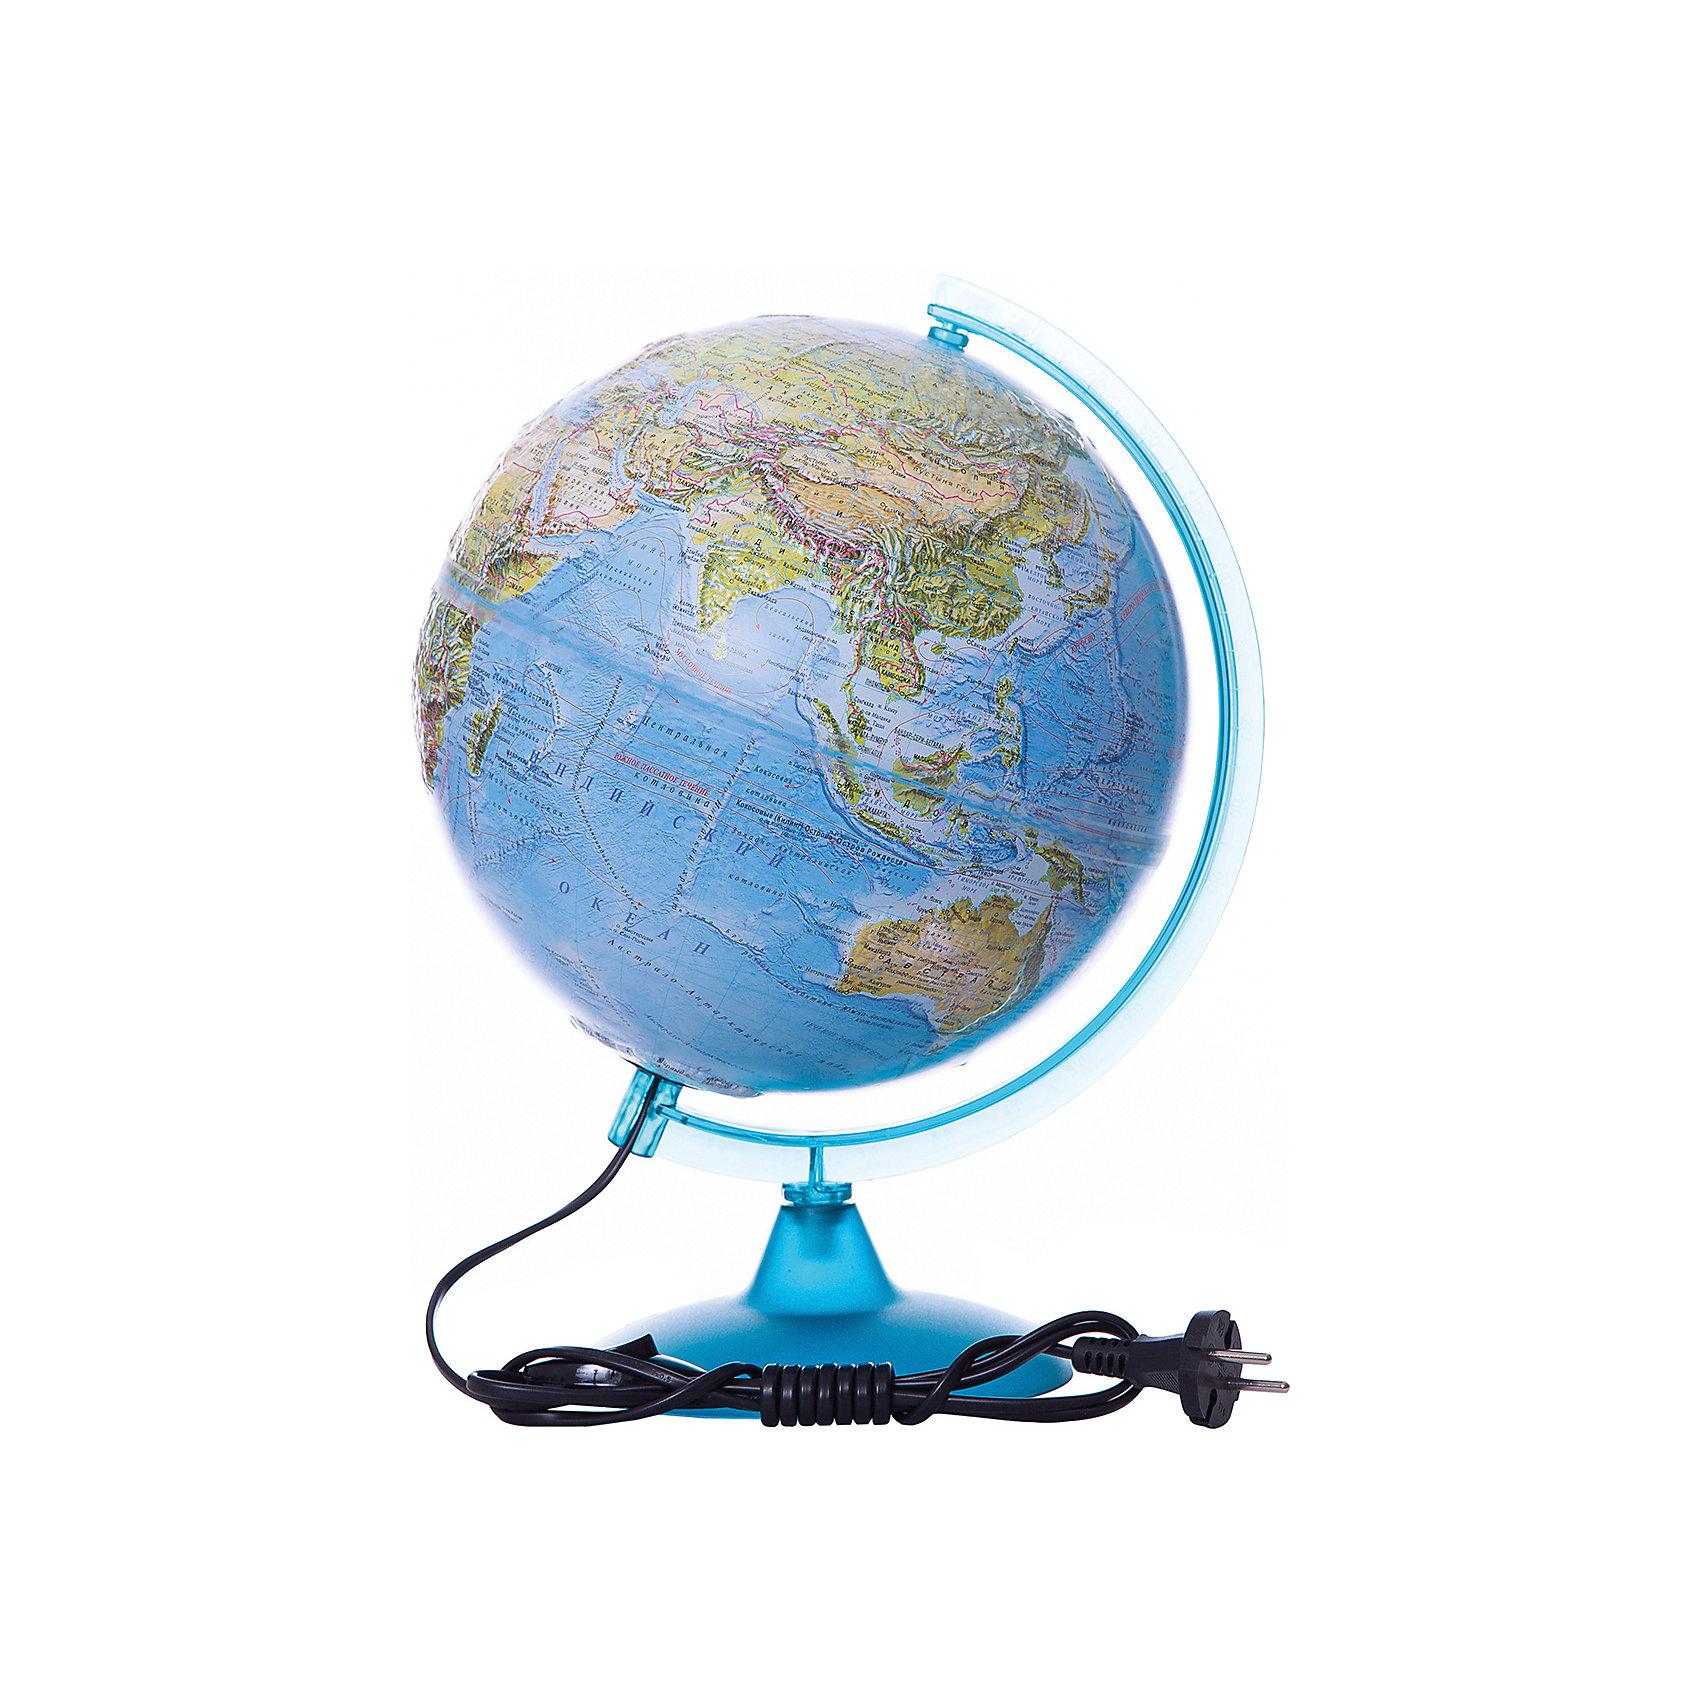 Глобус Земли «Двойная карта» рельефный с подсветкой, диаметр 250 ммГлобусы<br>Диаметр: 250 мм<br><br>Масштаб: 1:50000000<br><br>Материал подставки: Пластик<br><br>Цвет подставки: Прозрачный<br><br>Ширина мм: 260<br>Глубина мм: 260<br>Высота мм: 360<br>Вес г: 950<br>Возраст от месяцев: 72<br>Возраст до месяцев: 2147483647<br>Пол: Унисекс<br>Возраст: Детский<br>SKU: 5518227